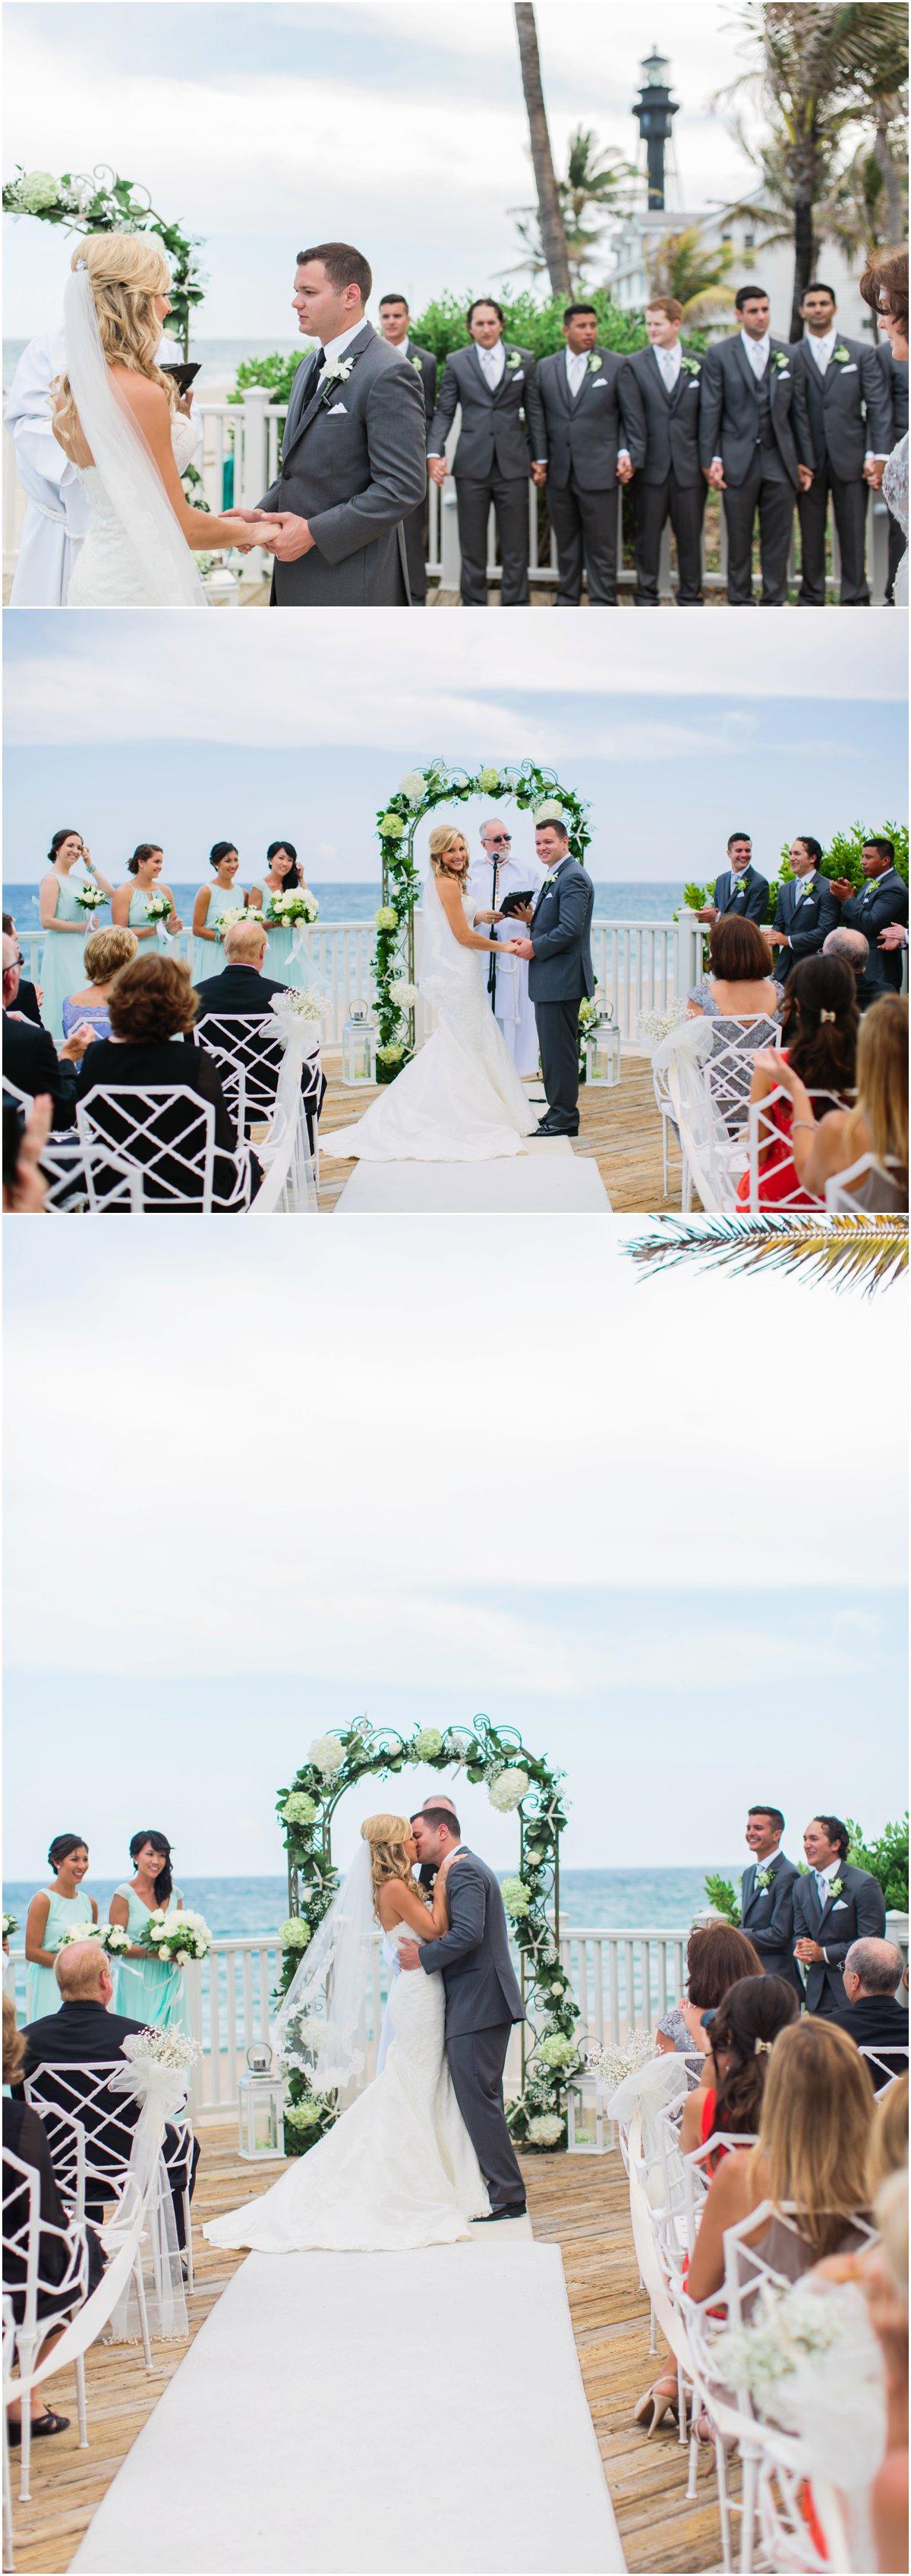 South-Florida-Wedding-Photographer-Hillsboro-lighthouse_0018